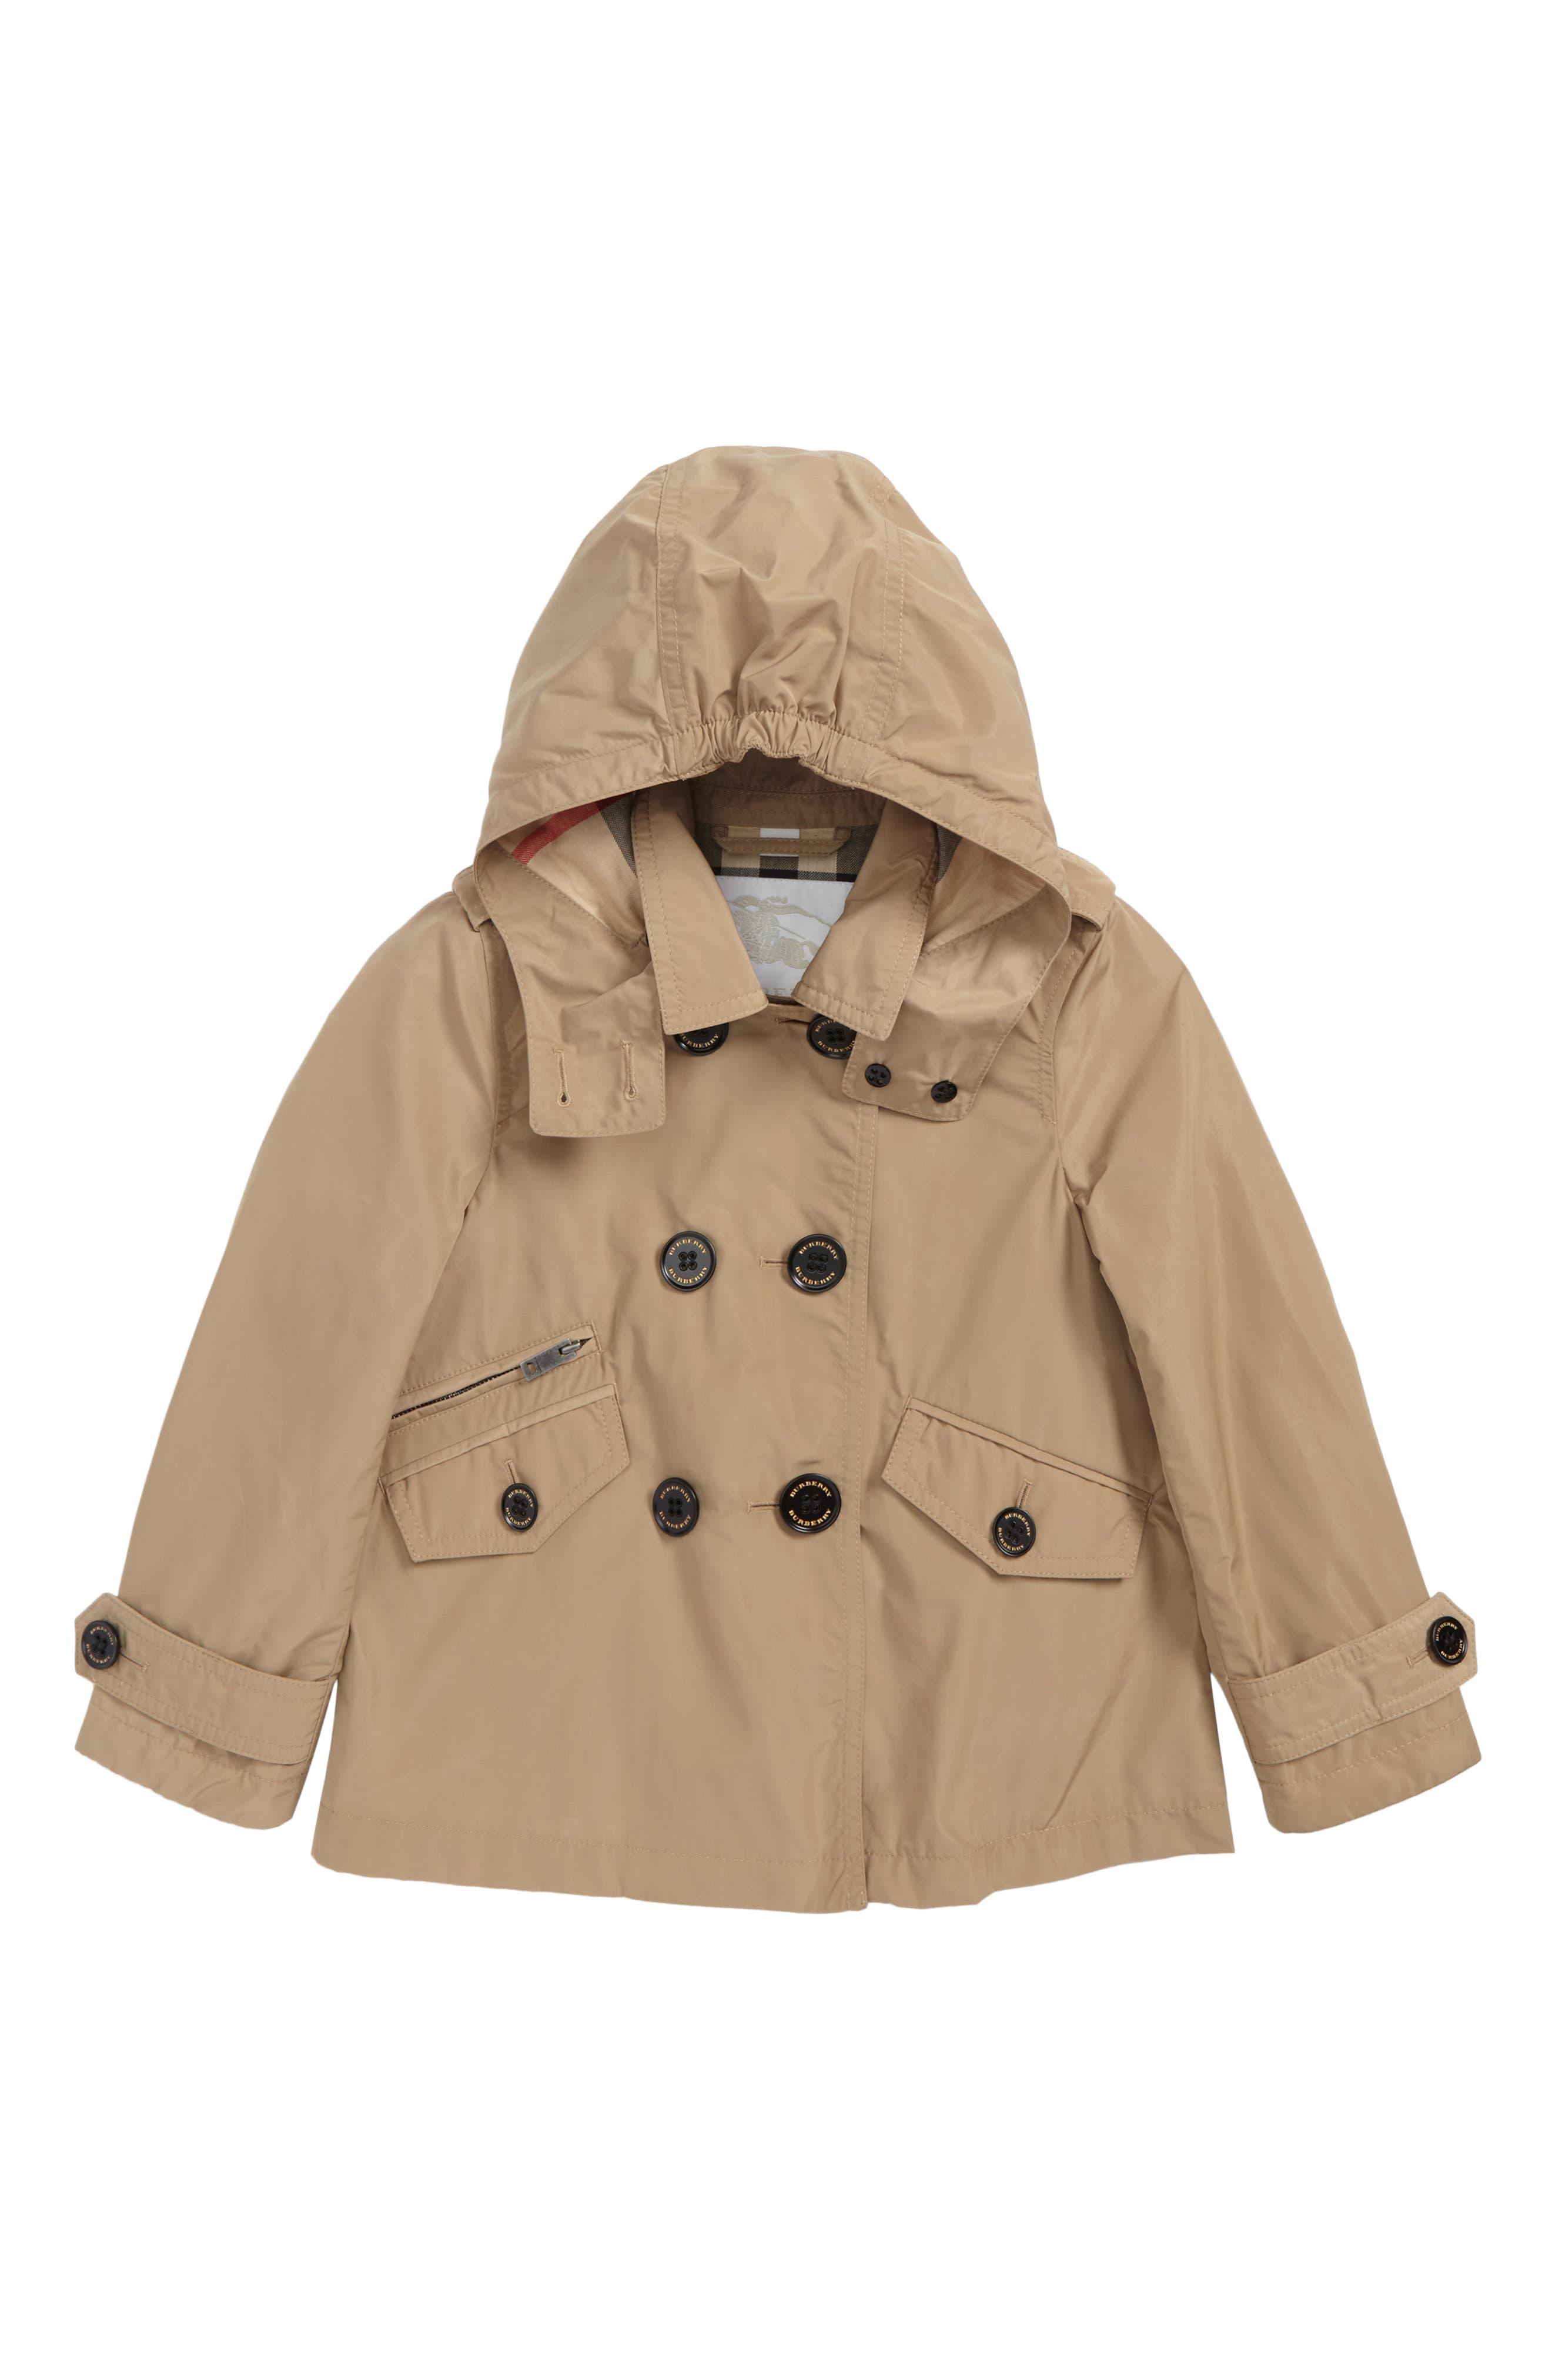 Alternate Image 1 Selected - Burberry Margeretta Hooded Jacket (Little Girls & Big Girls)